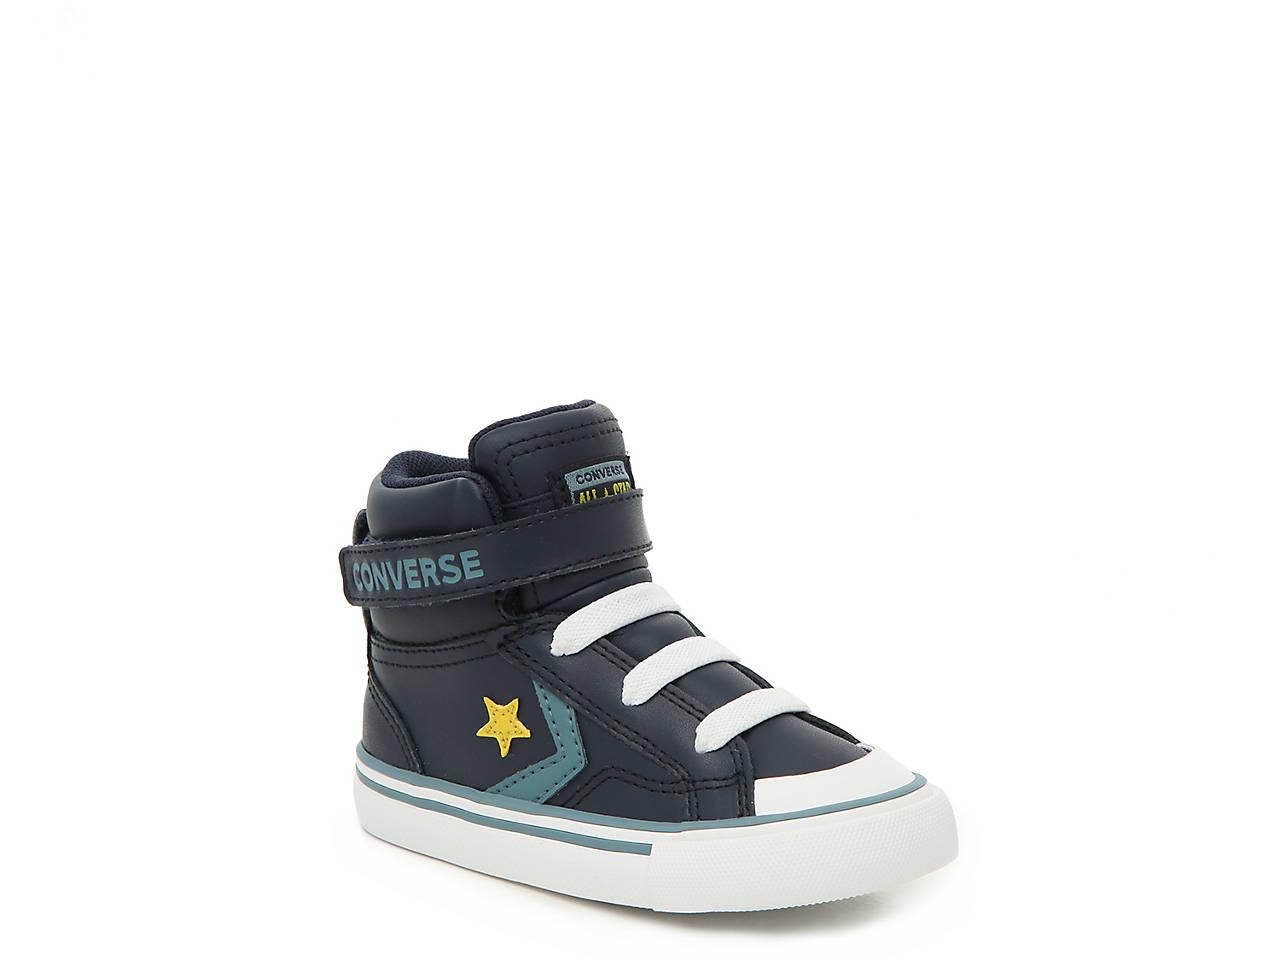 307c68bcc611b Converse Pro Blaze Infant   Toddler High-Top Sneaker Kids Shoes